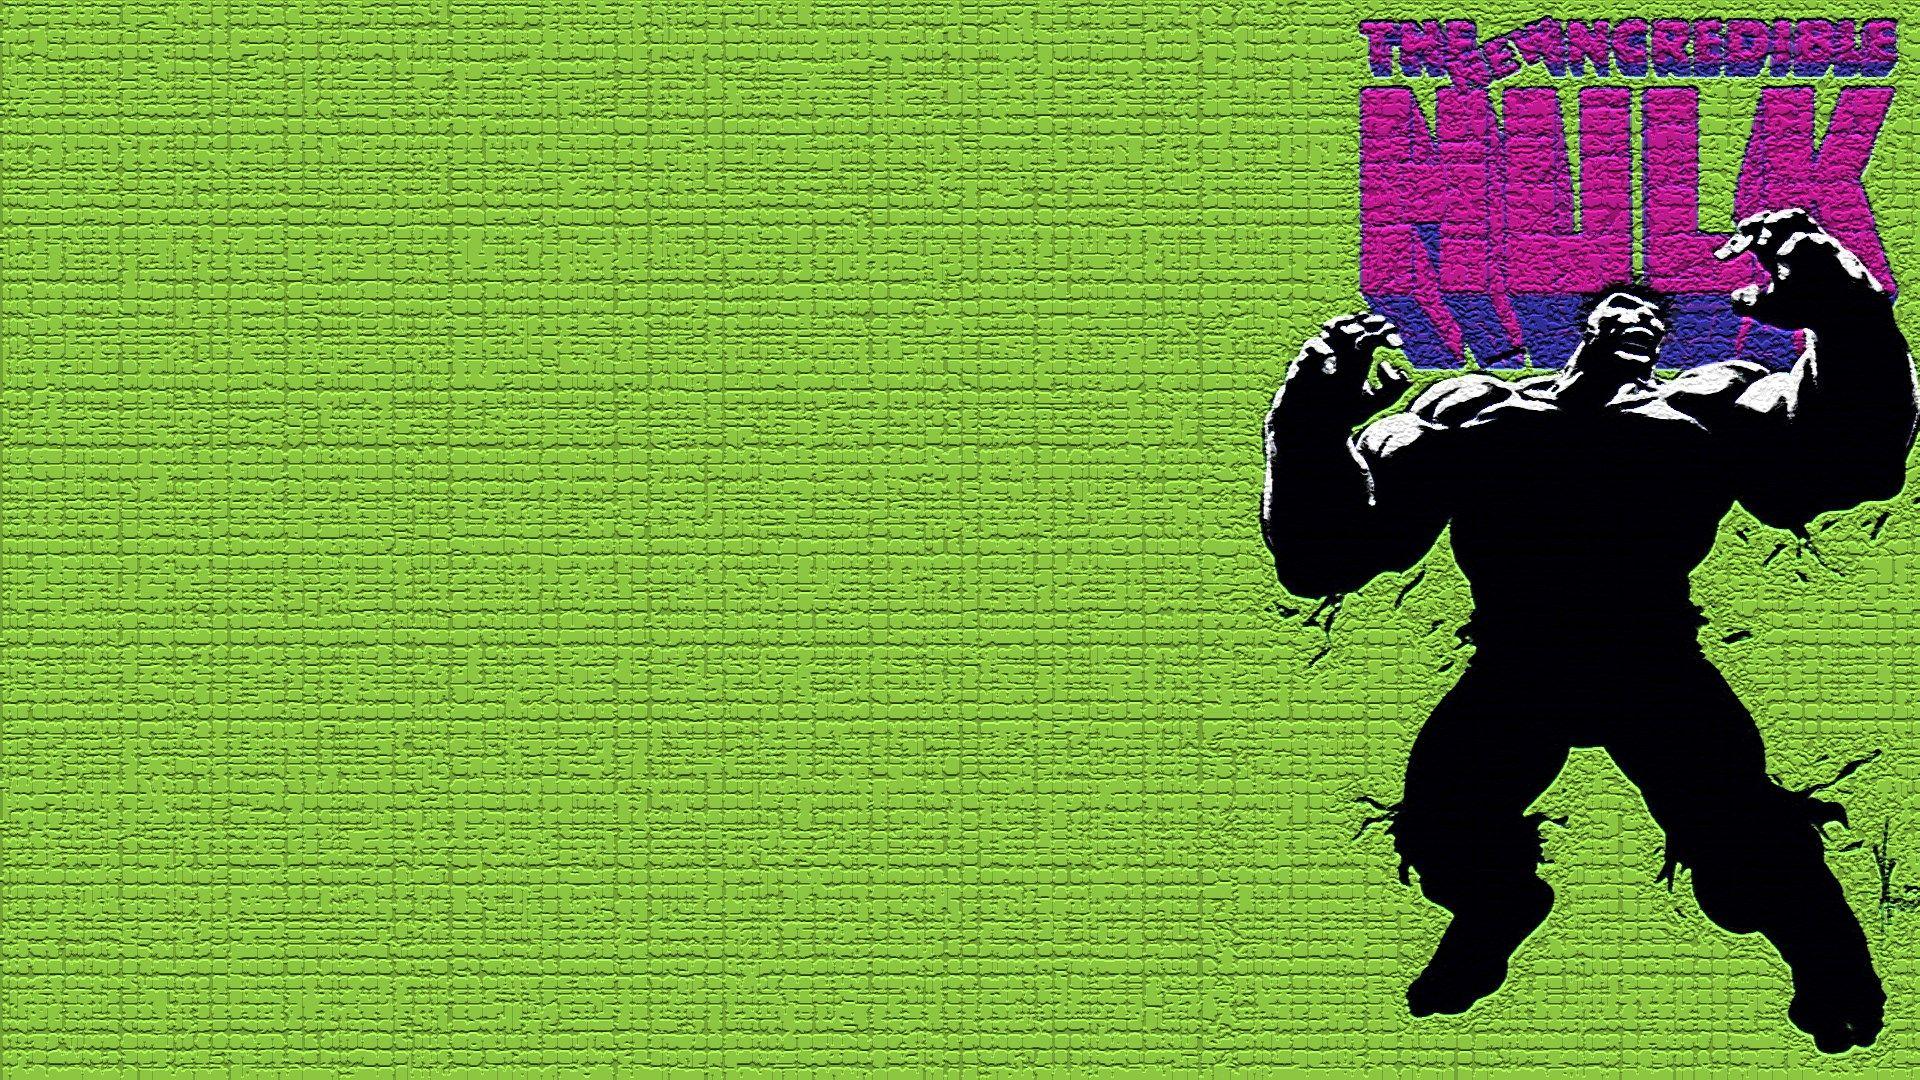 1614432 Pretty The Incredible Hulk Wallpaper The Incredibles